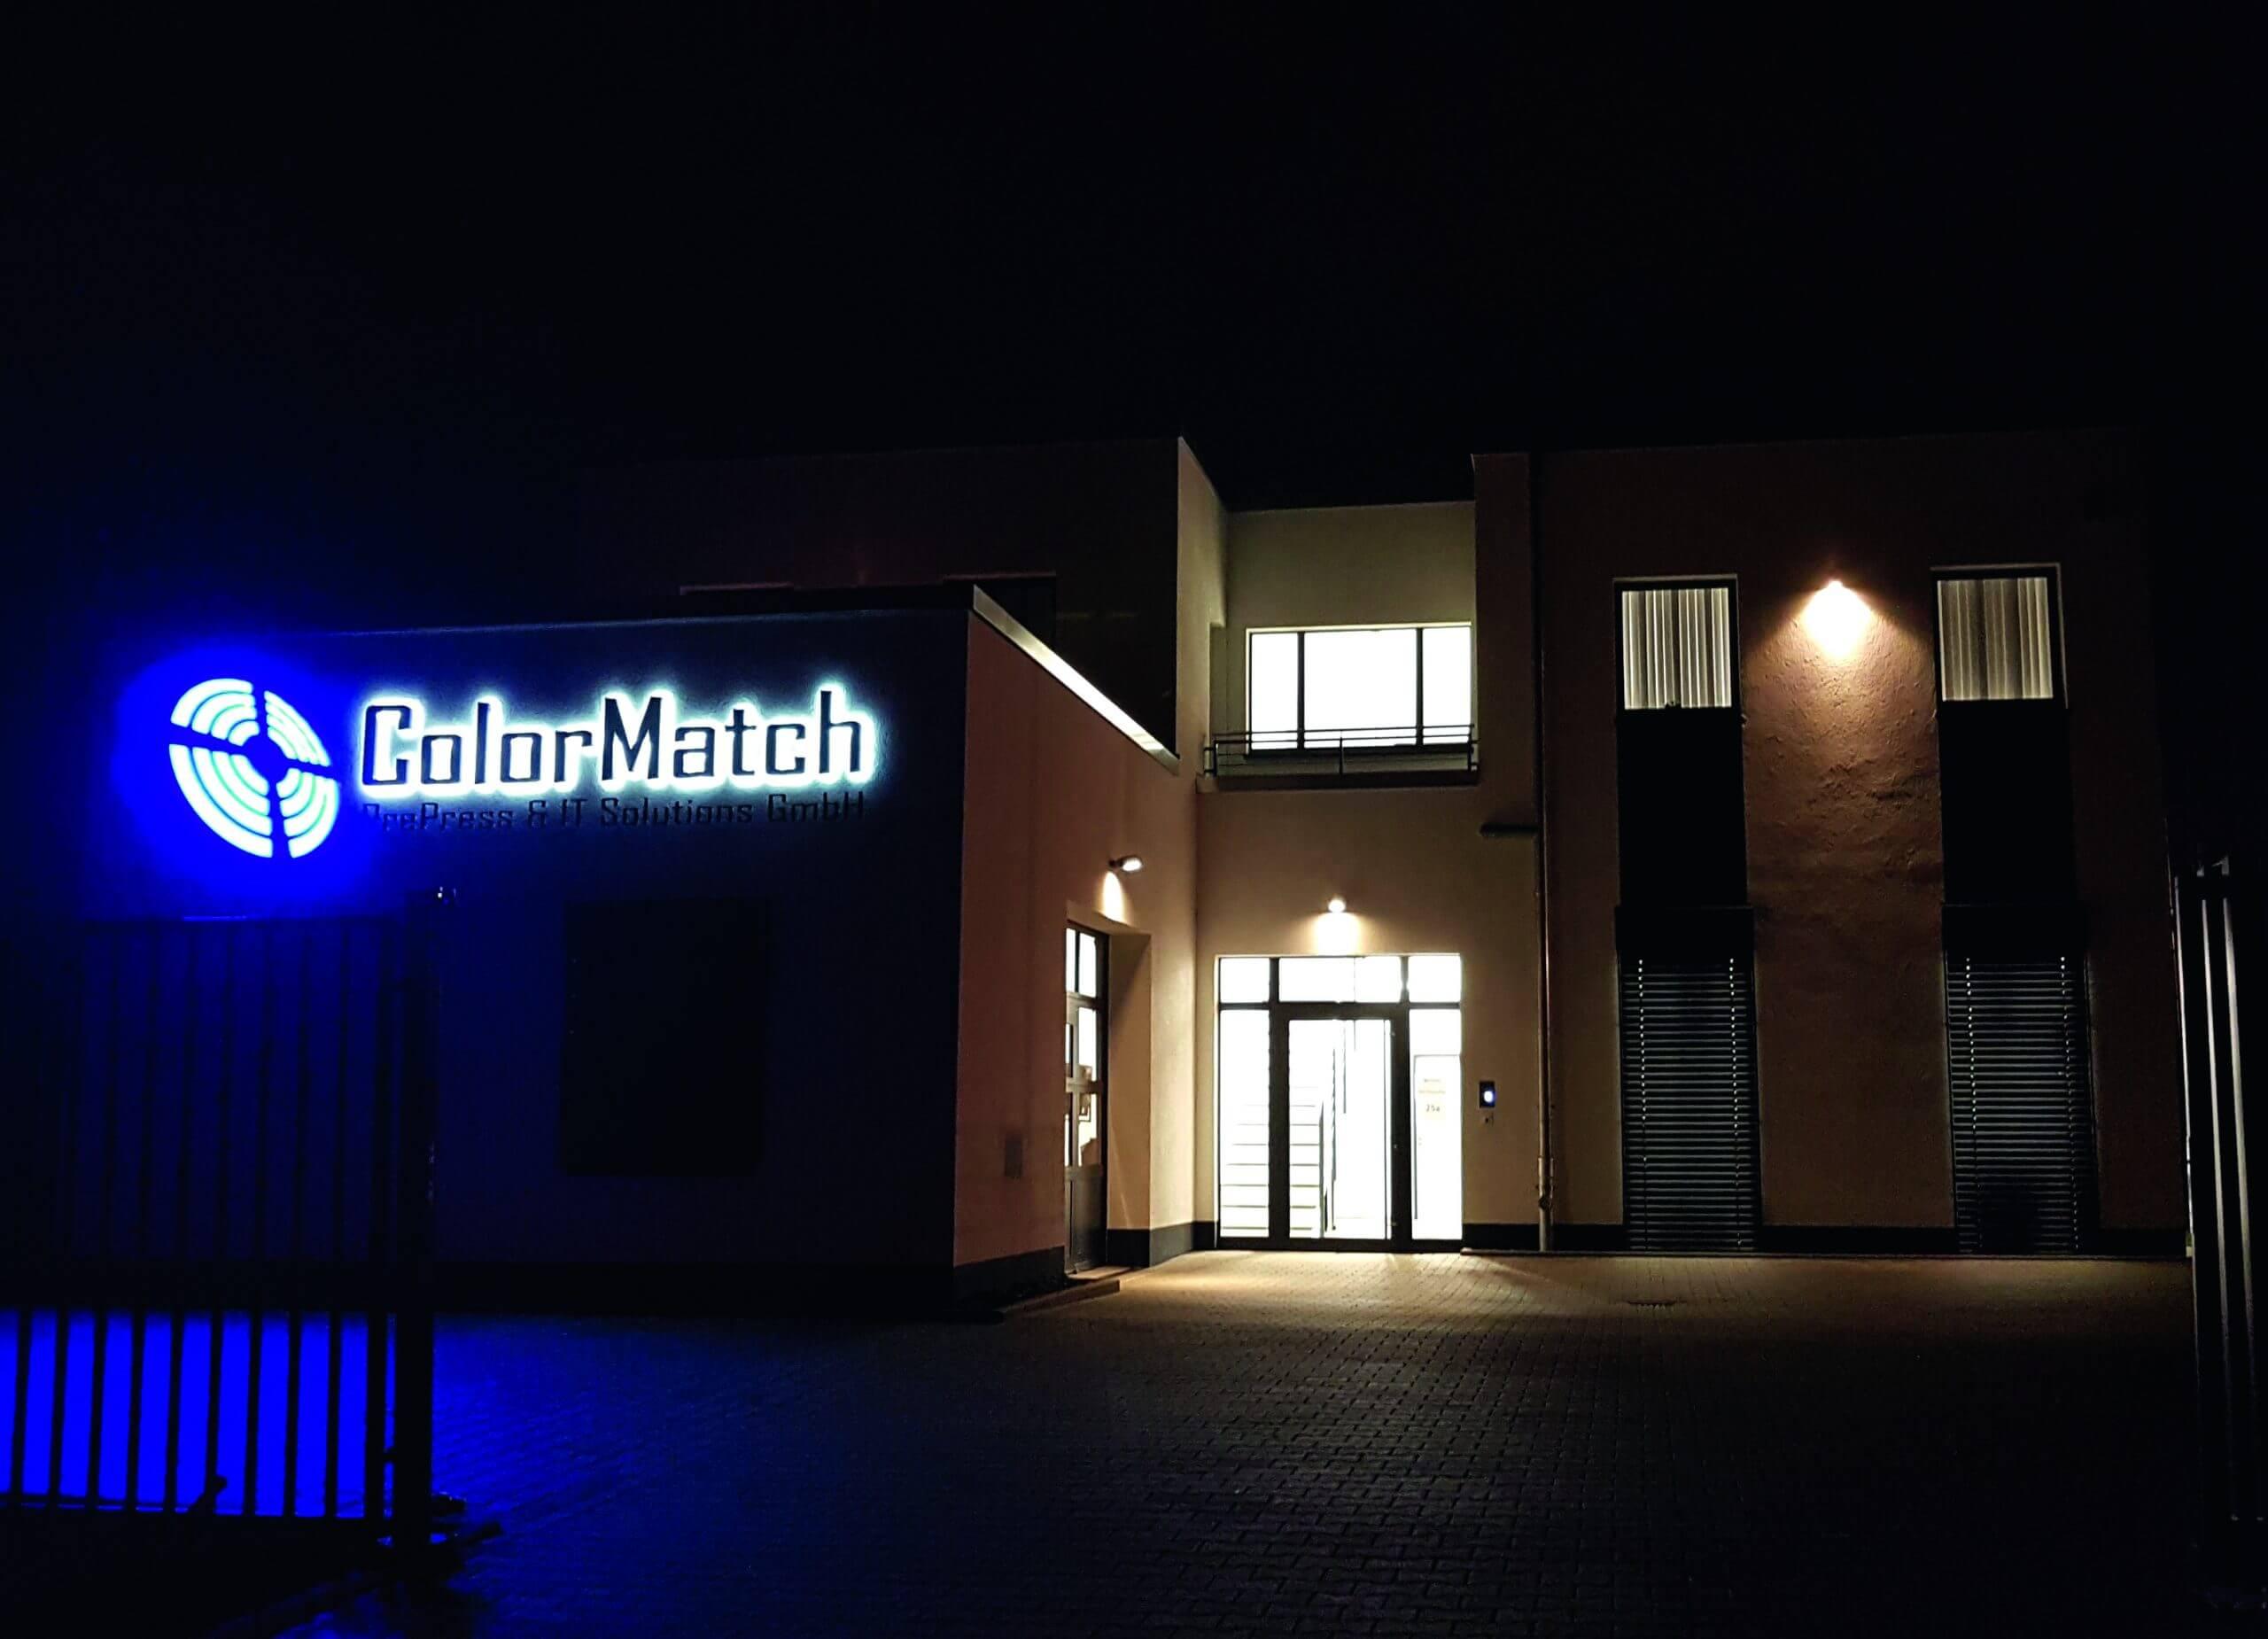 https://www.plassmeier-bau.de/wp-content/uploads/2020/12/Colormatch_Nacht-scaled.jpg